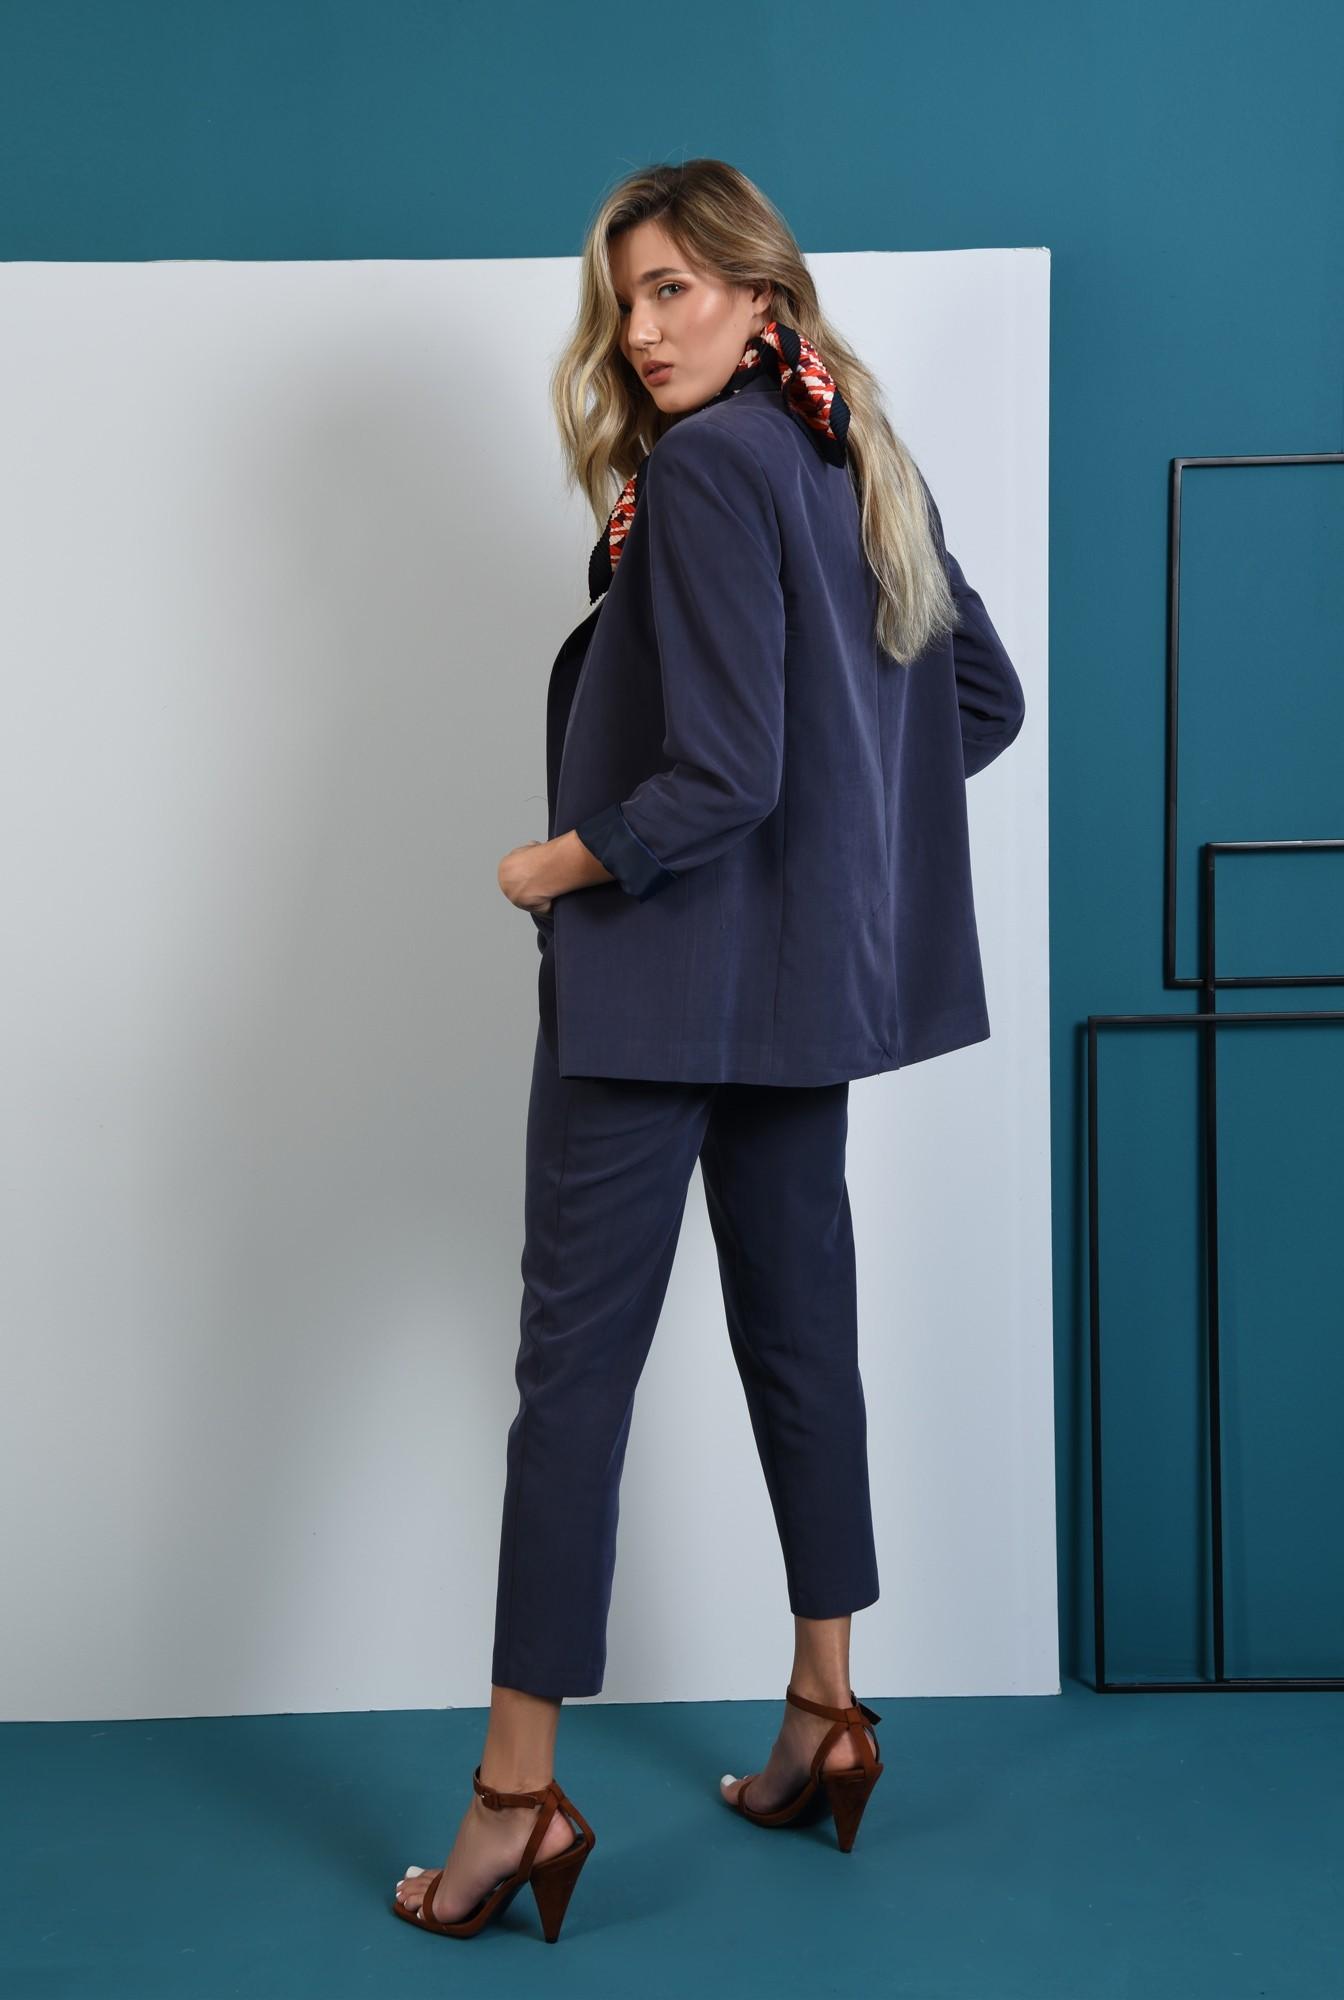 0 - pantaloni cu buzunare laterale, tigareta